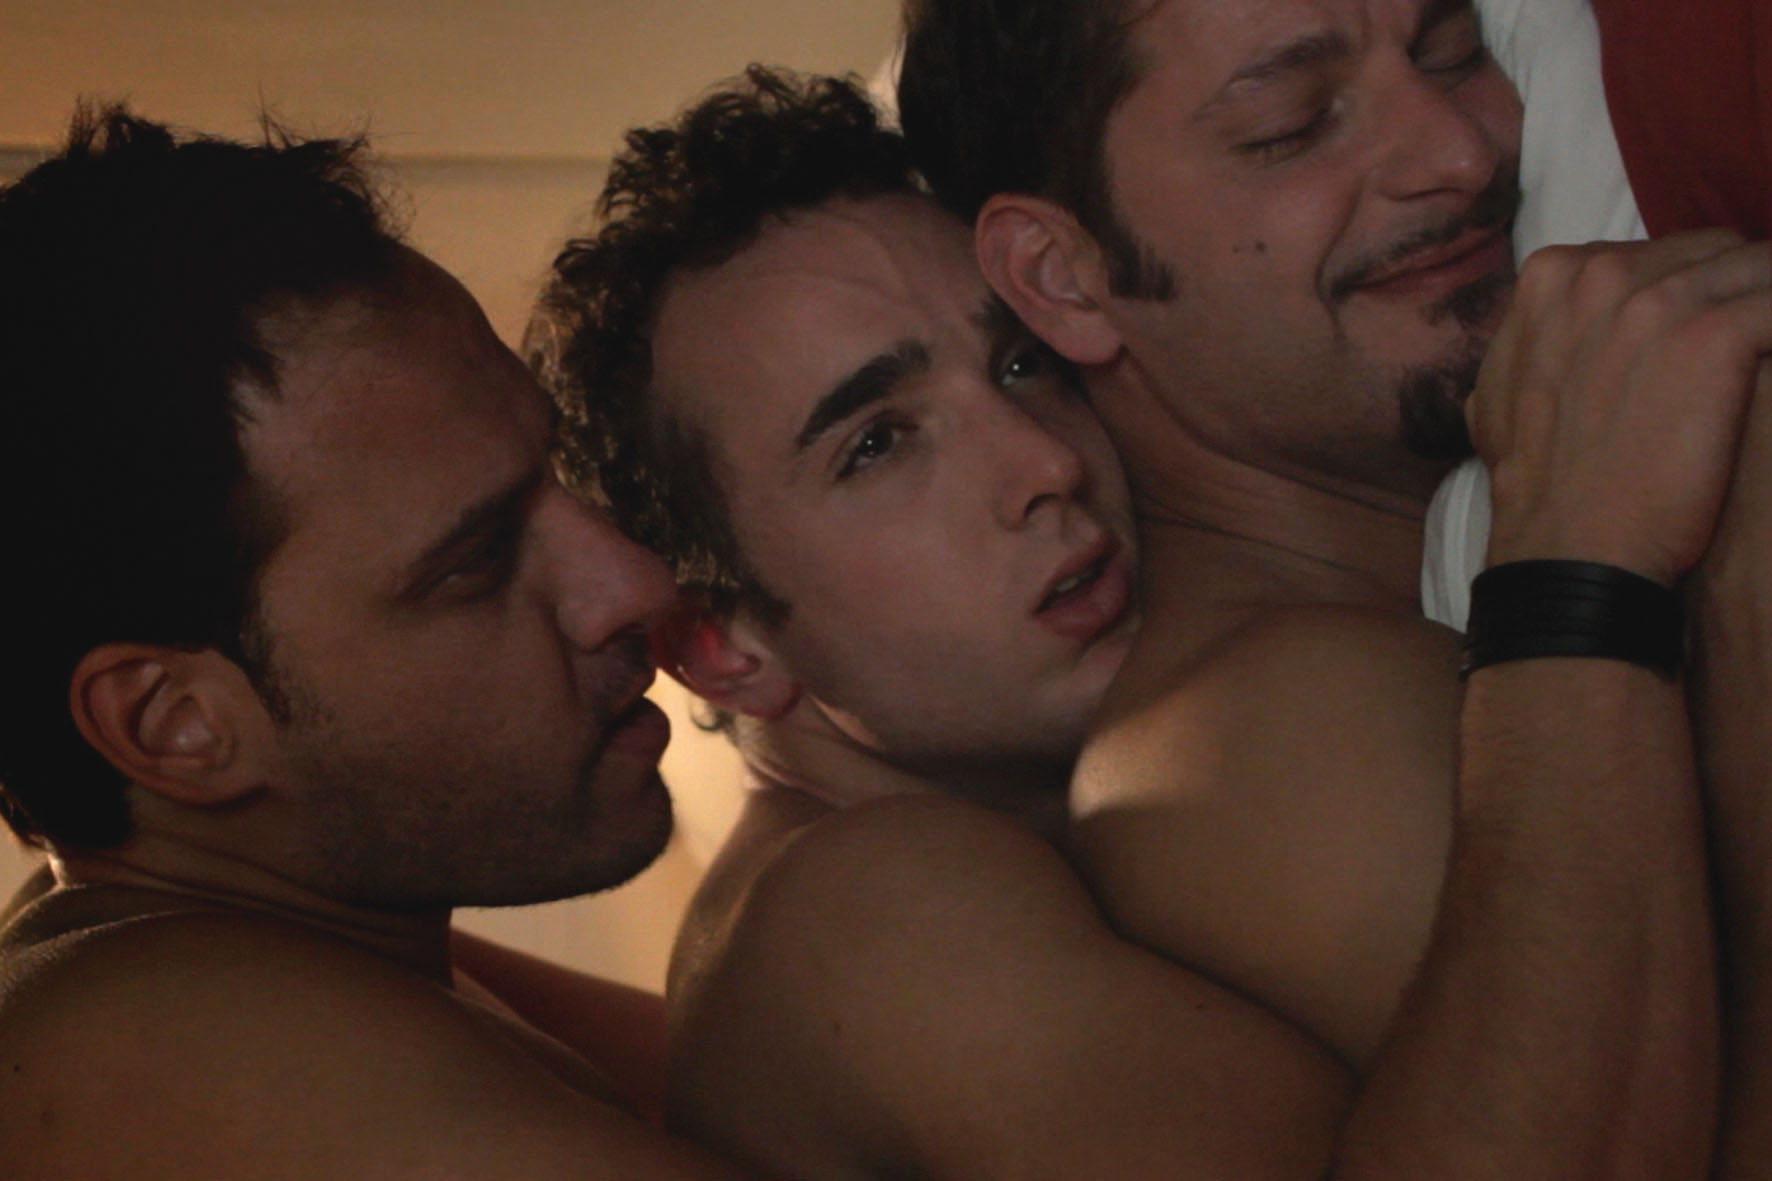 3 lesbianas dominicanas en cabana parte 4 - 1 part 3